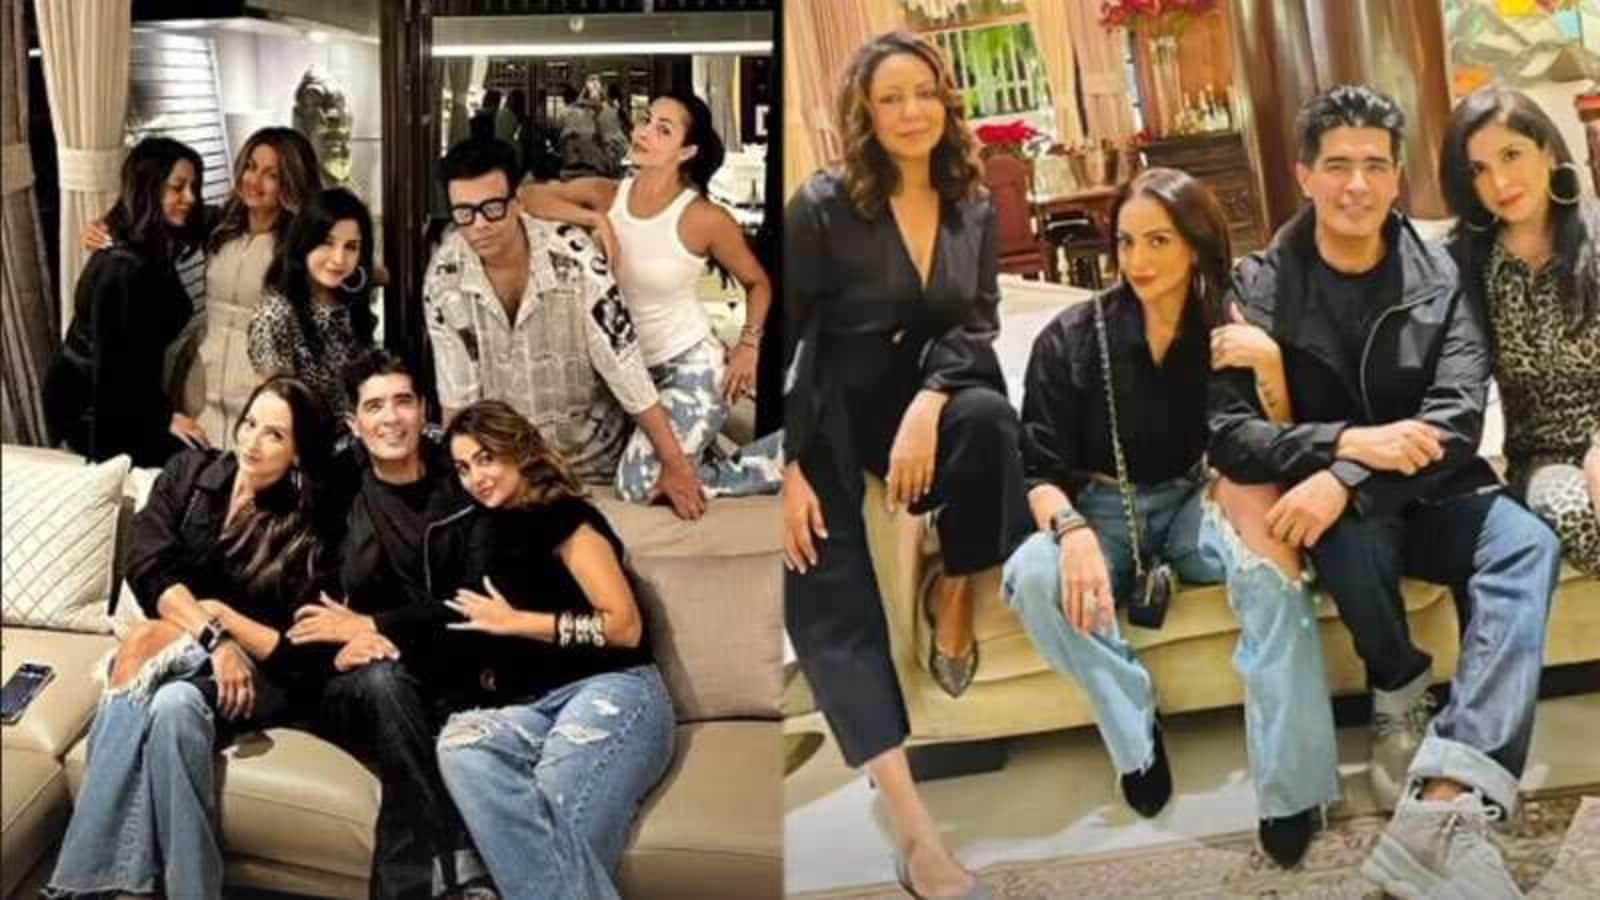 Gauri Khan steals attention in black as she joins Malaika Arora, Karan Johar, Karisma at Manish Malhotra's house party